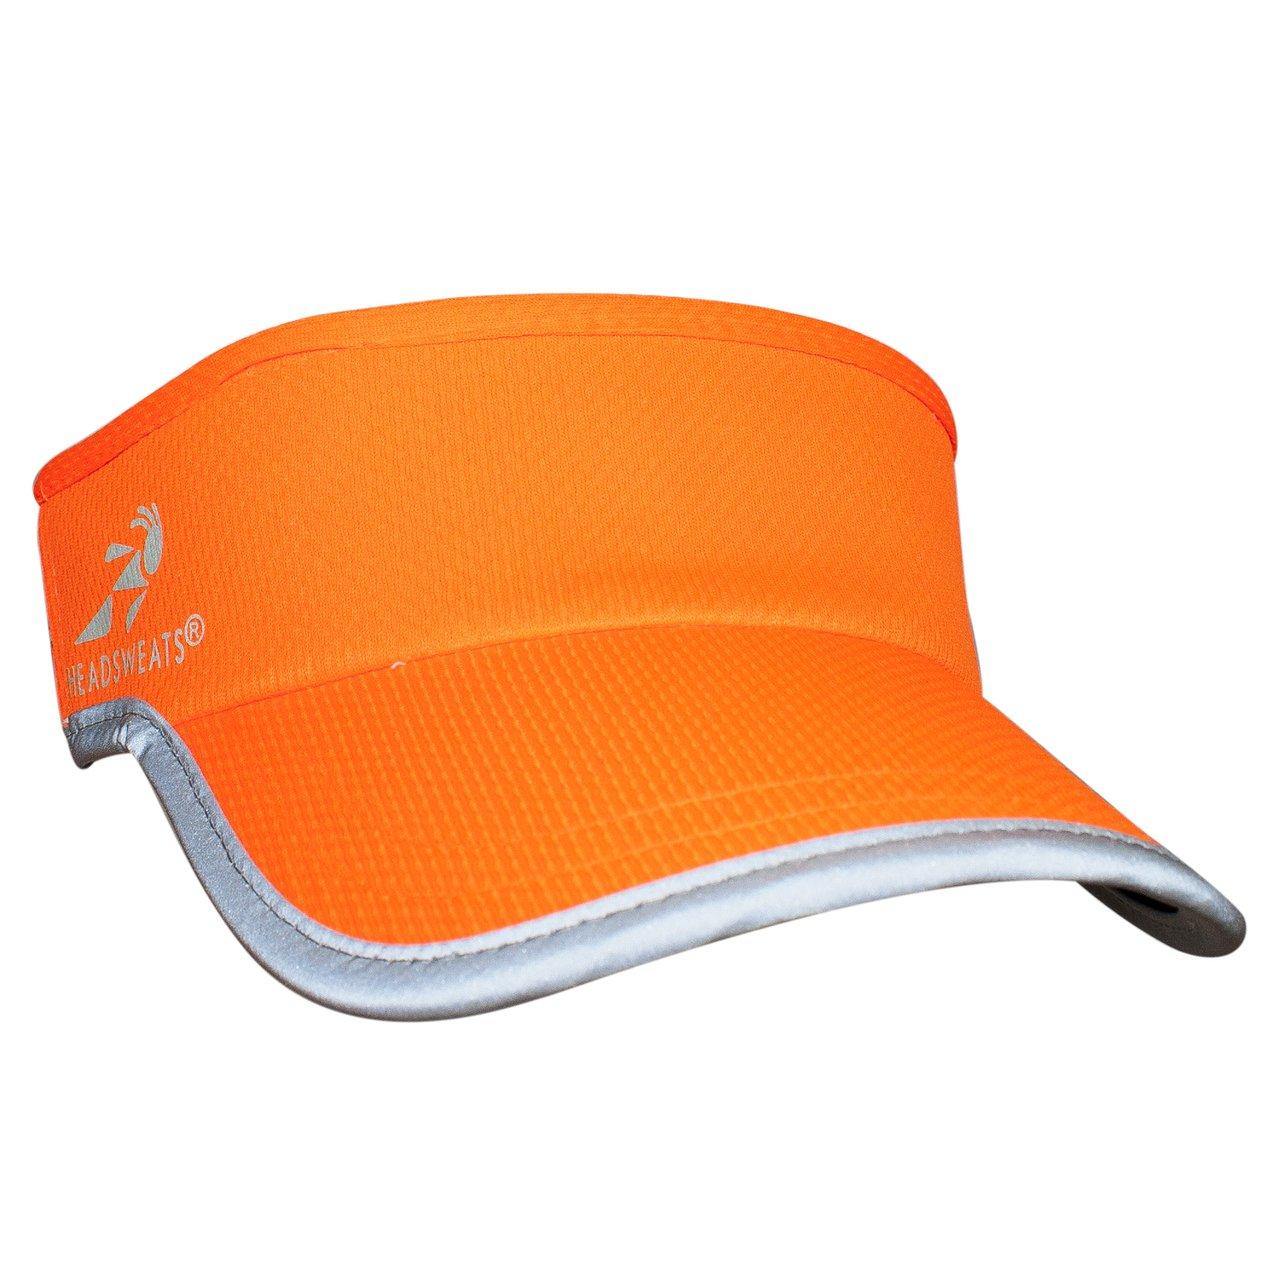 Headsweats Supervisor Headwear, Hi Viz Orange, One Size by Headsweats